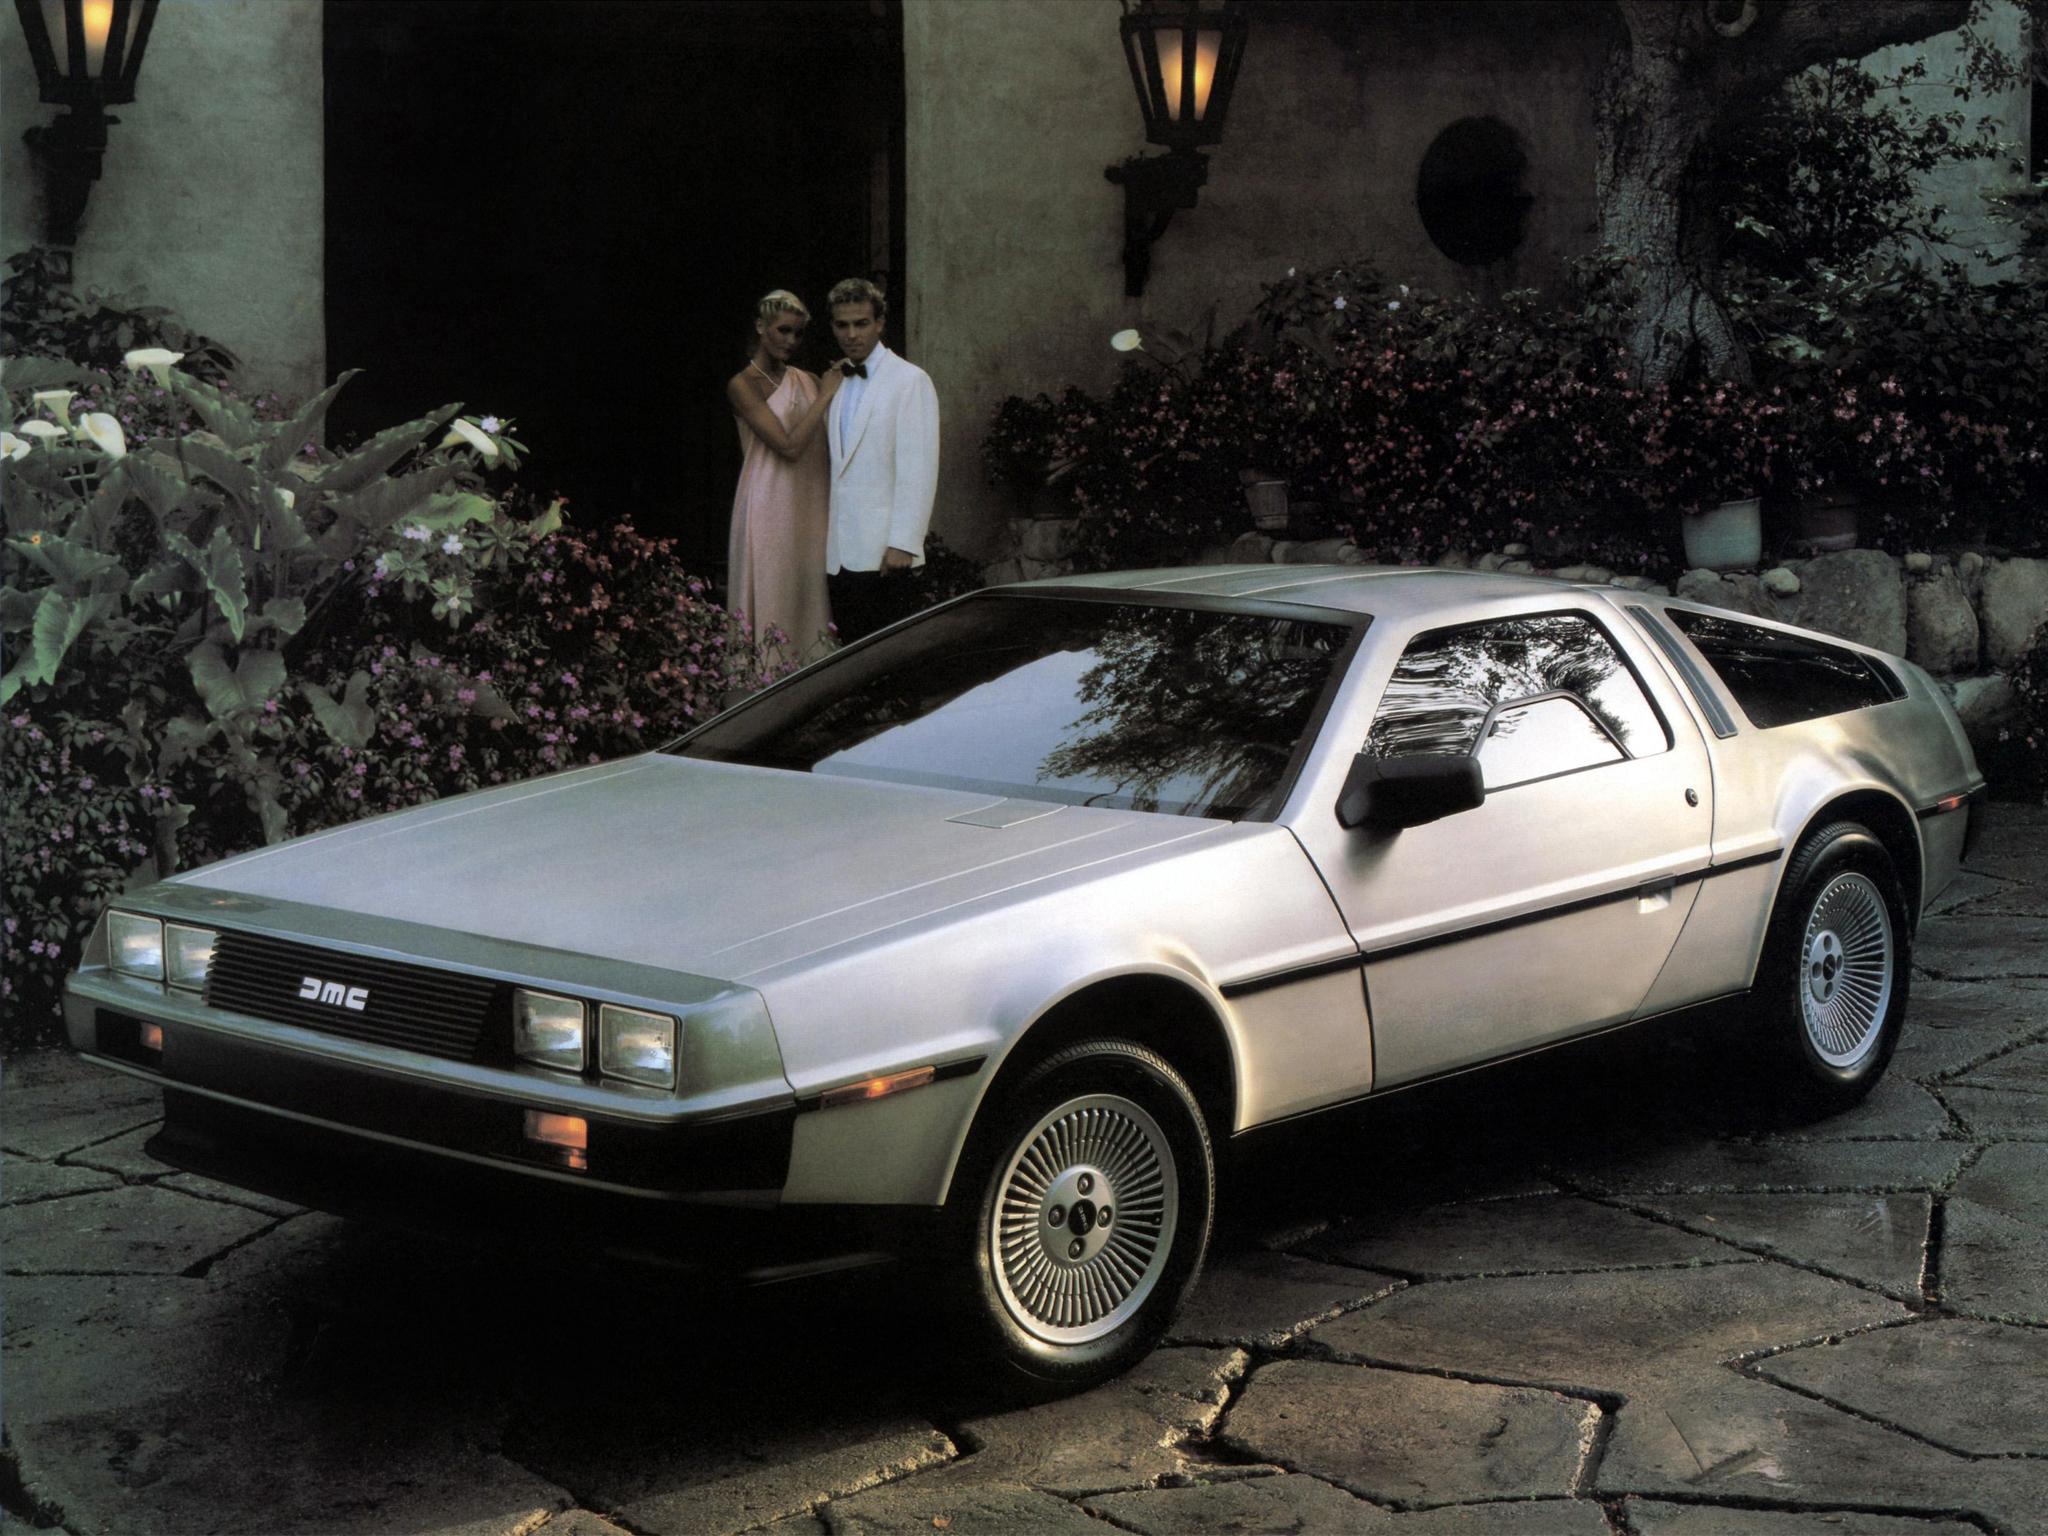 nowy DeLorean DMC 12